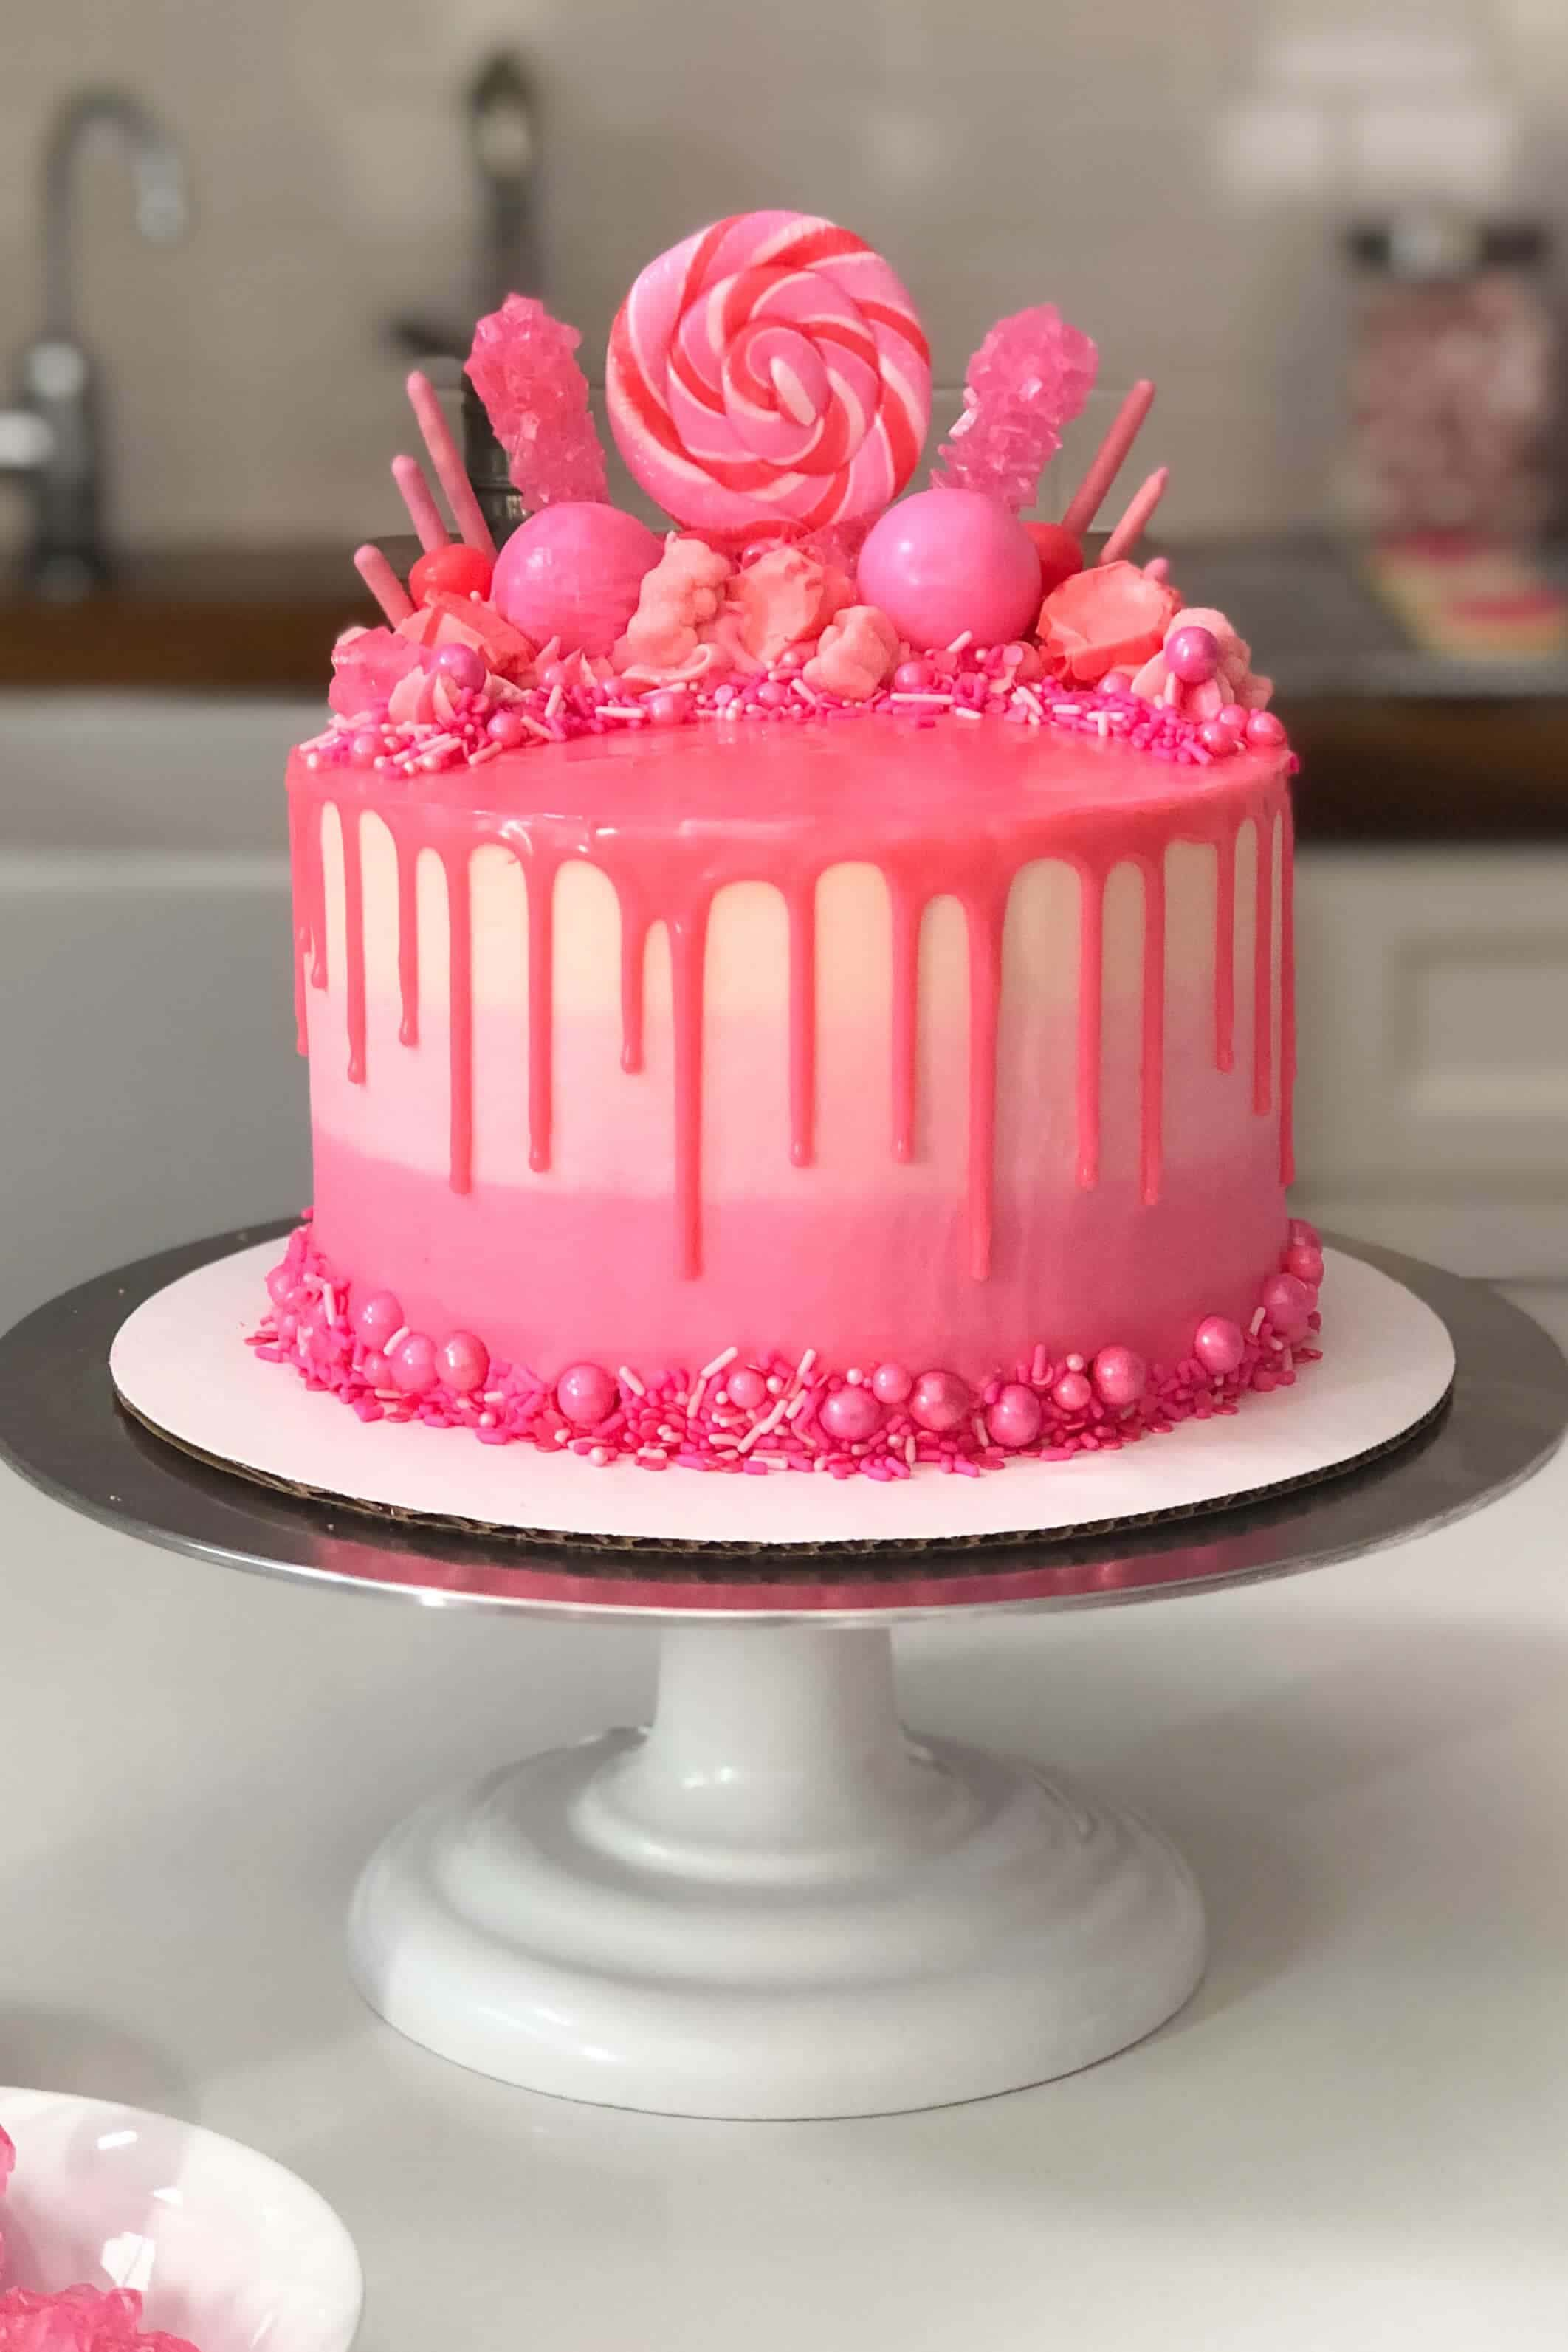 Drip cake recipe tutorial tips to make the perfect drip